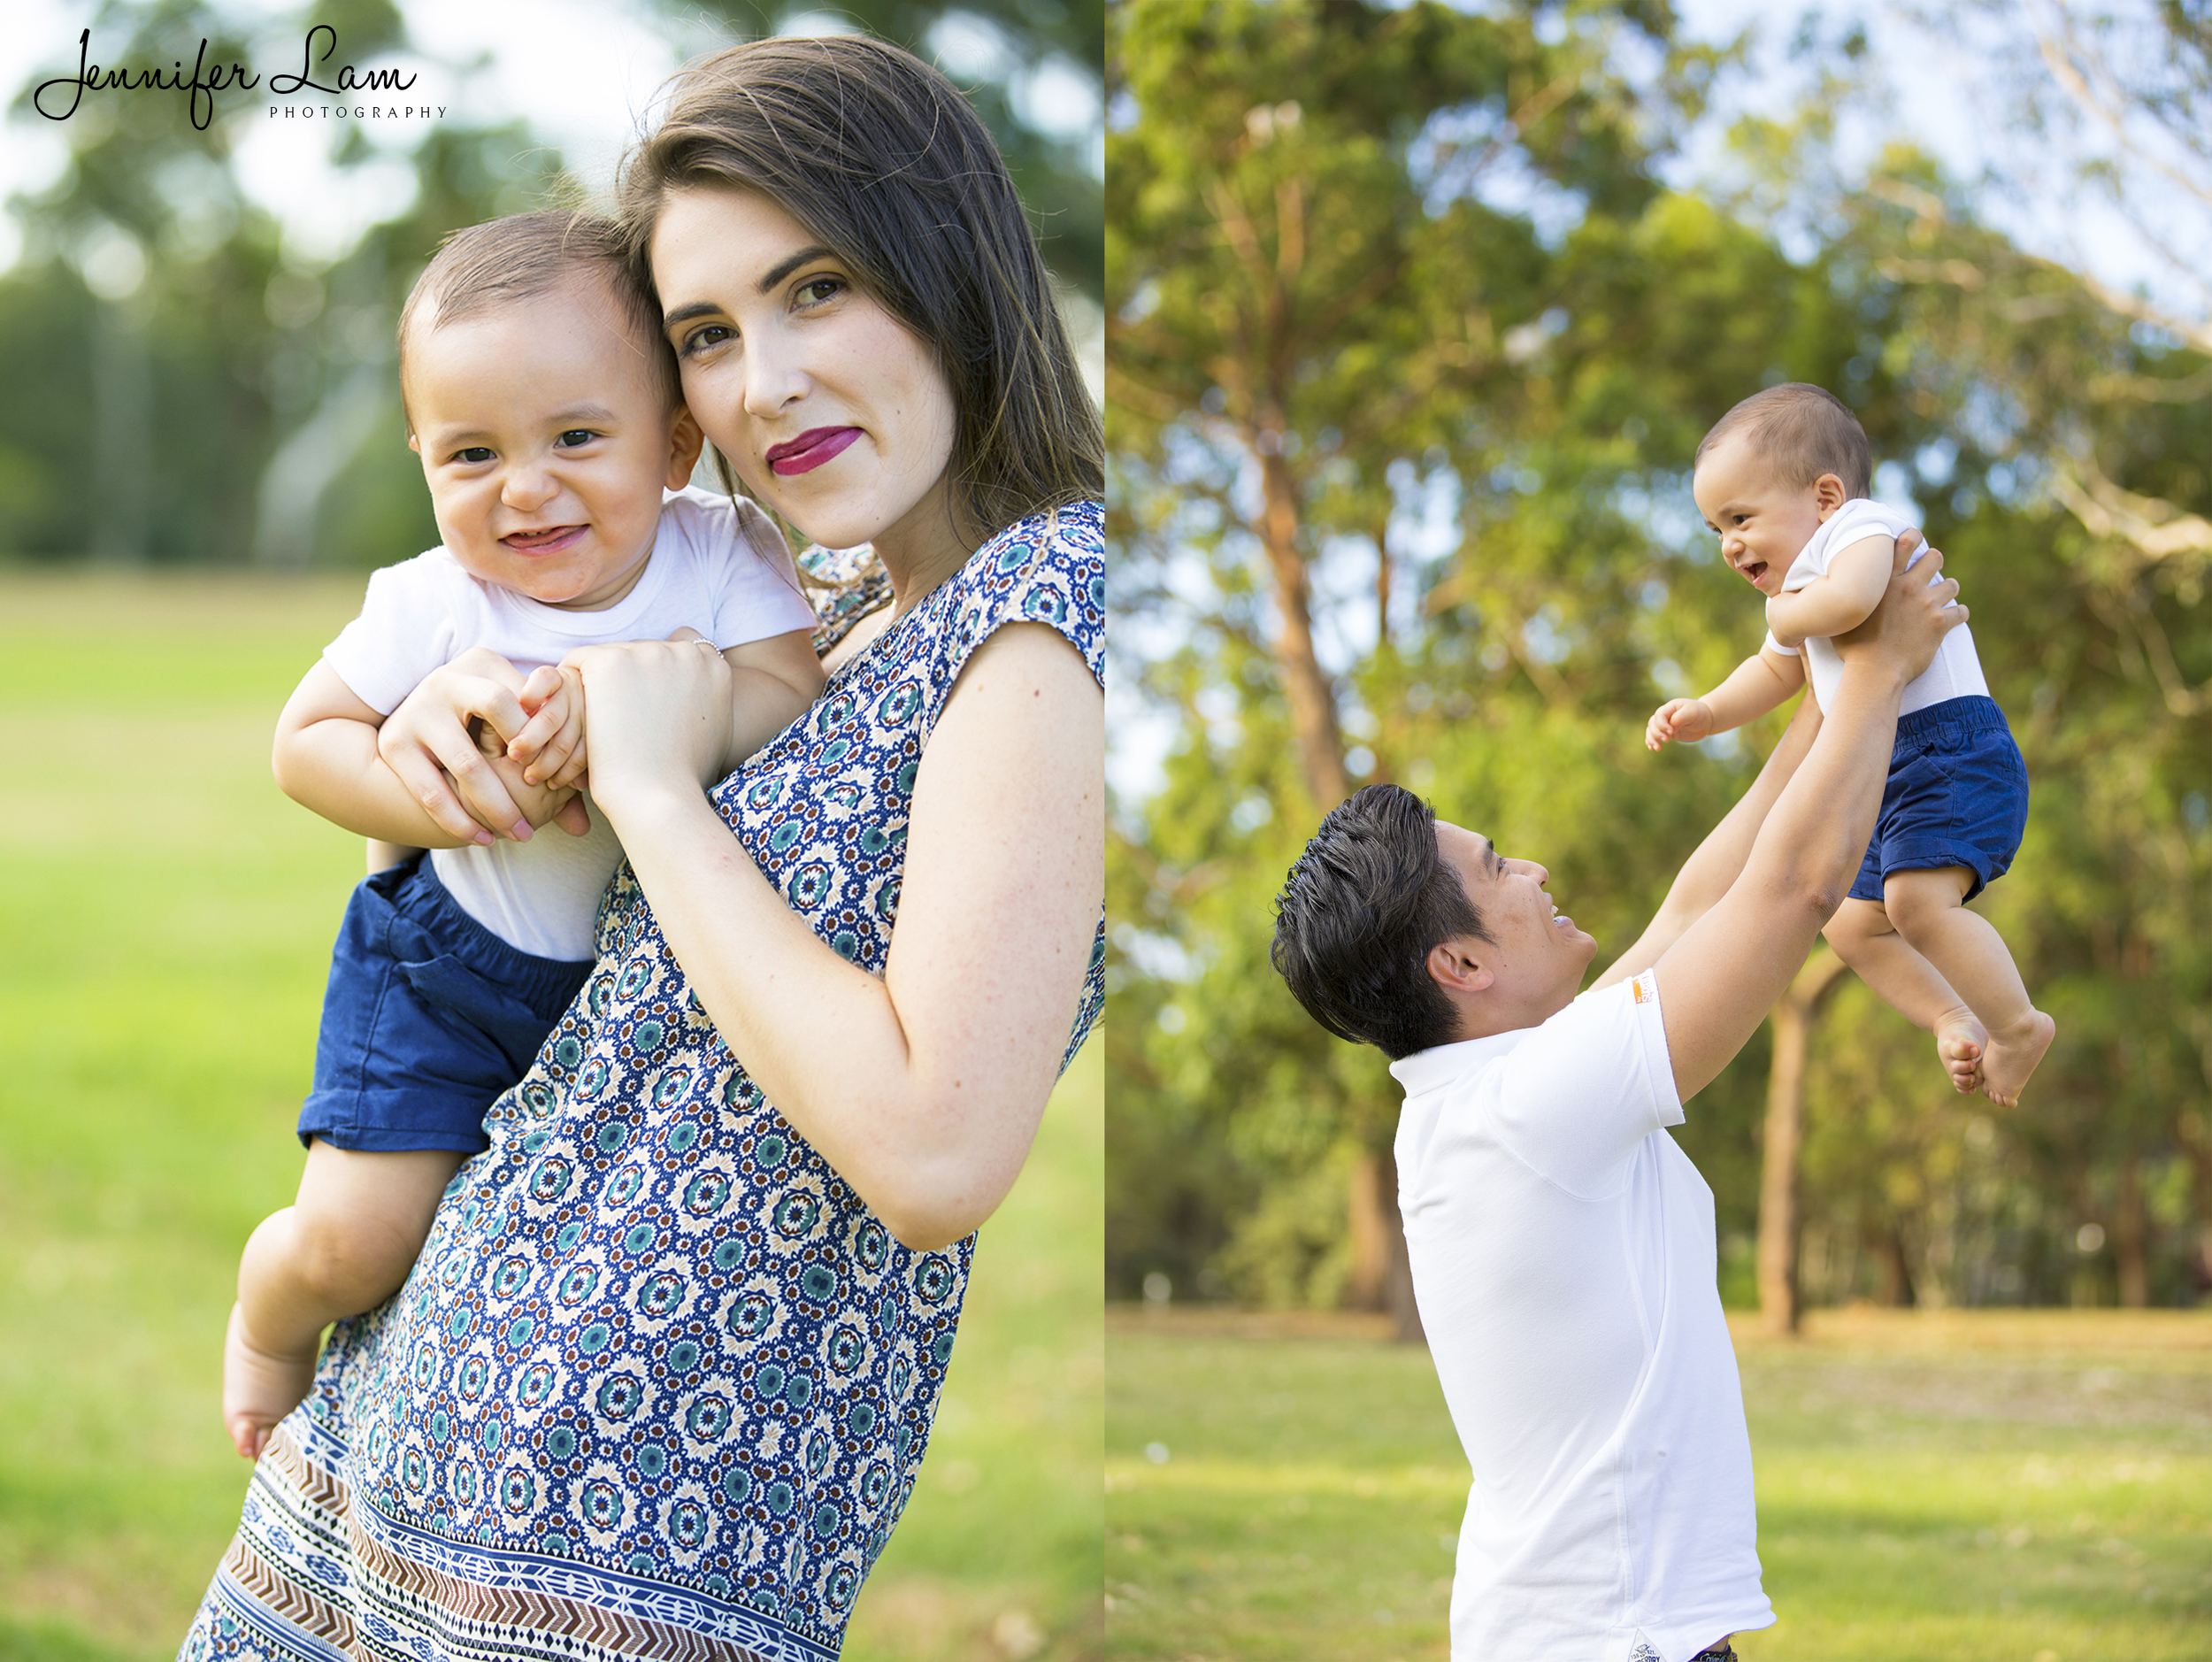 First Birthday - Sydney Family Portrait Photography - Jennifer Lam Photography (11).jpg